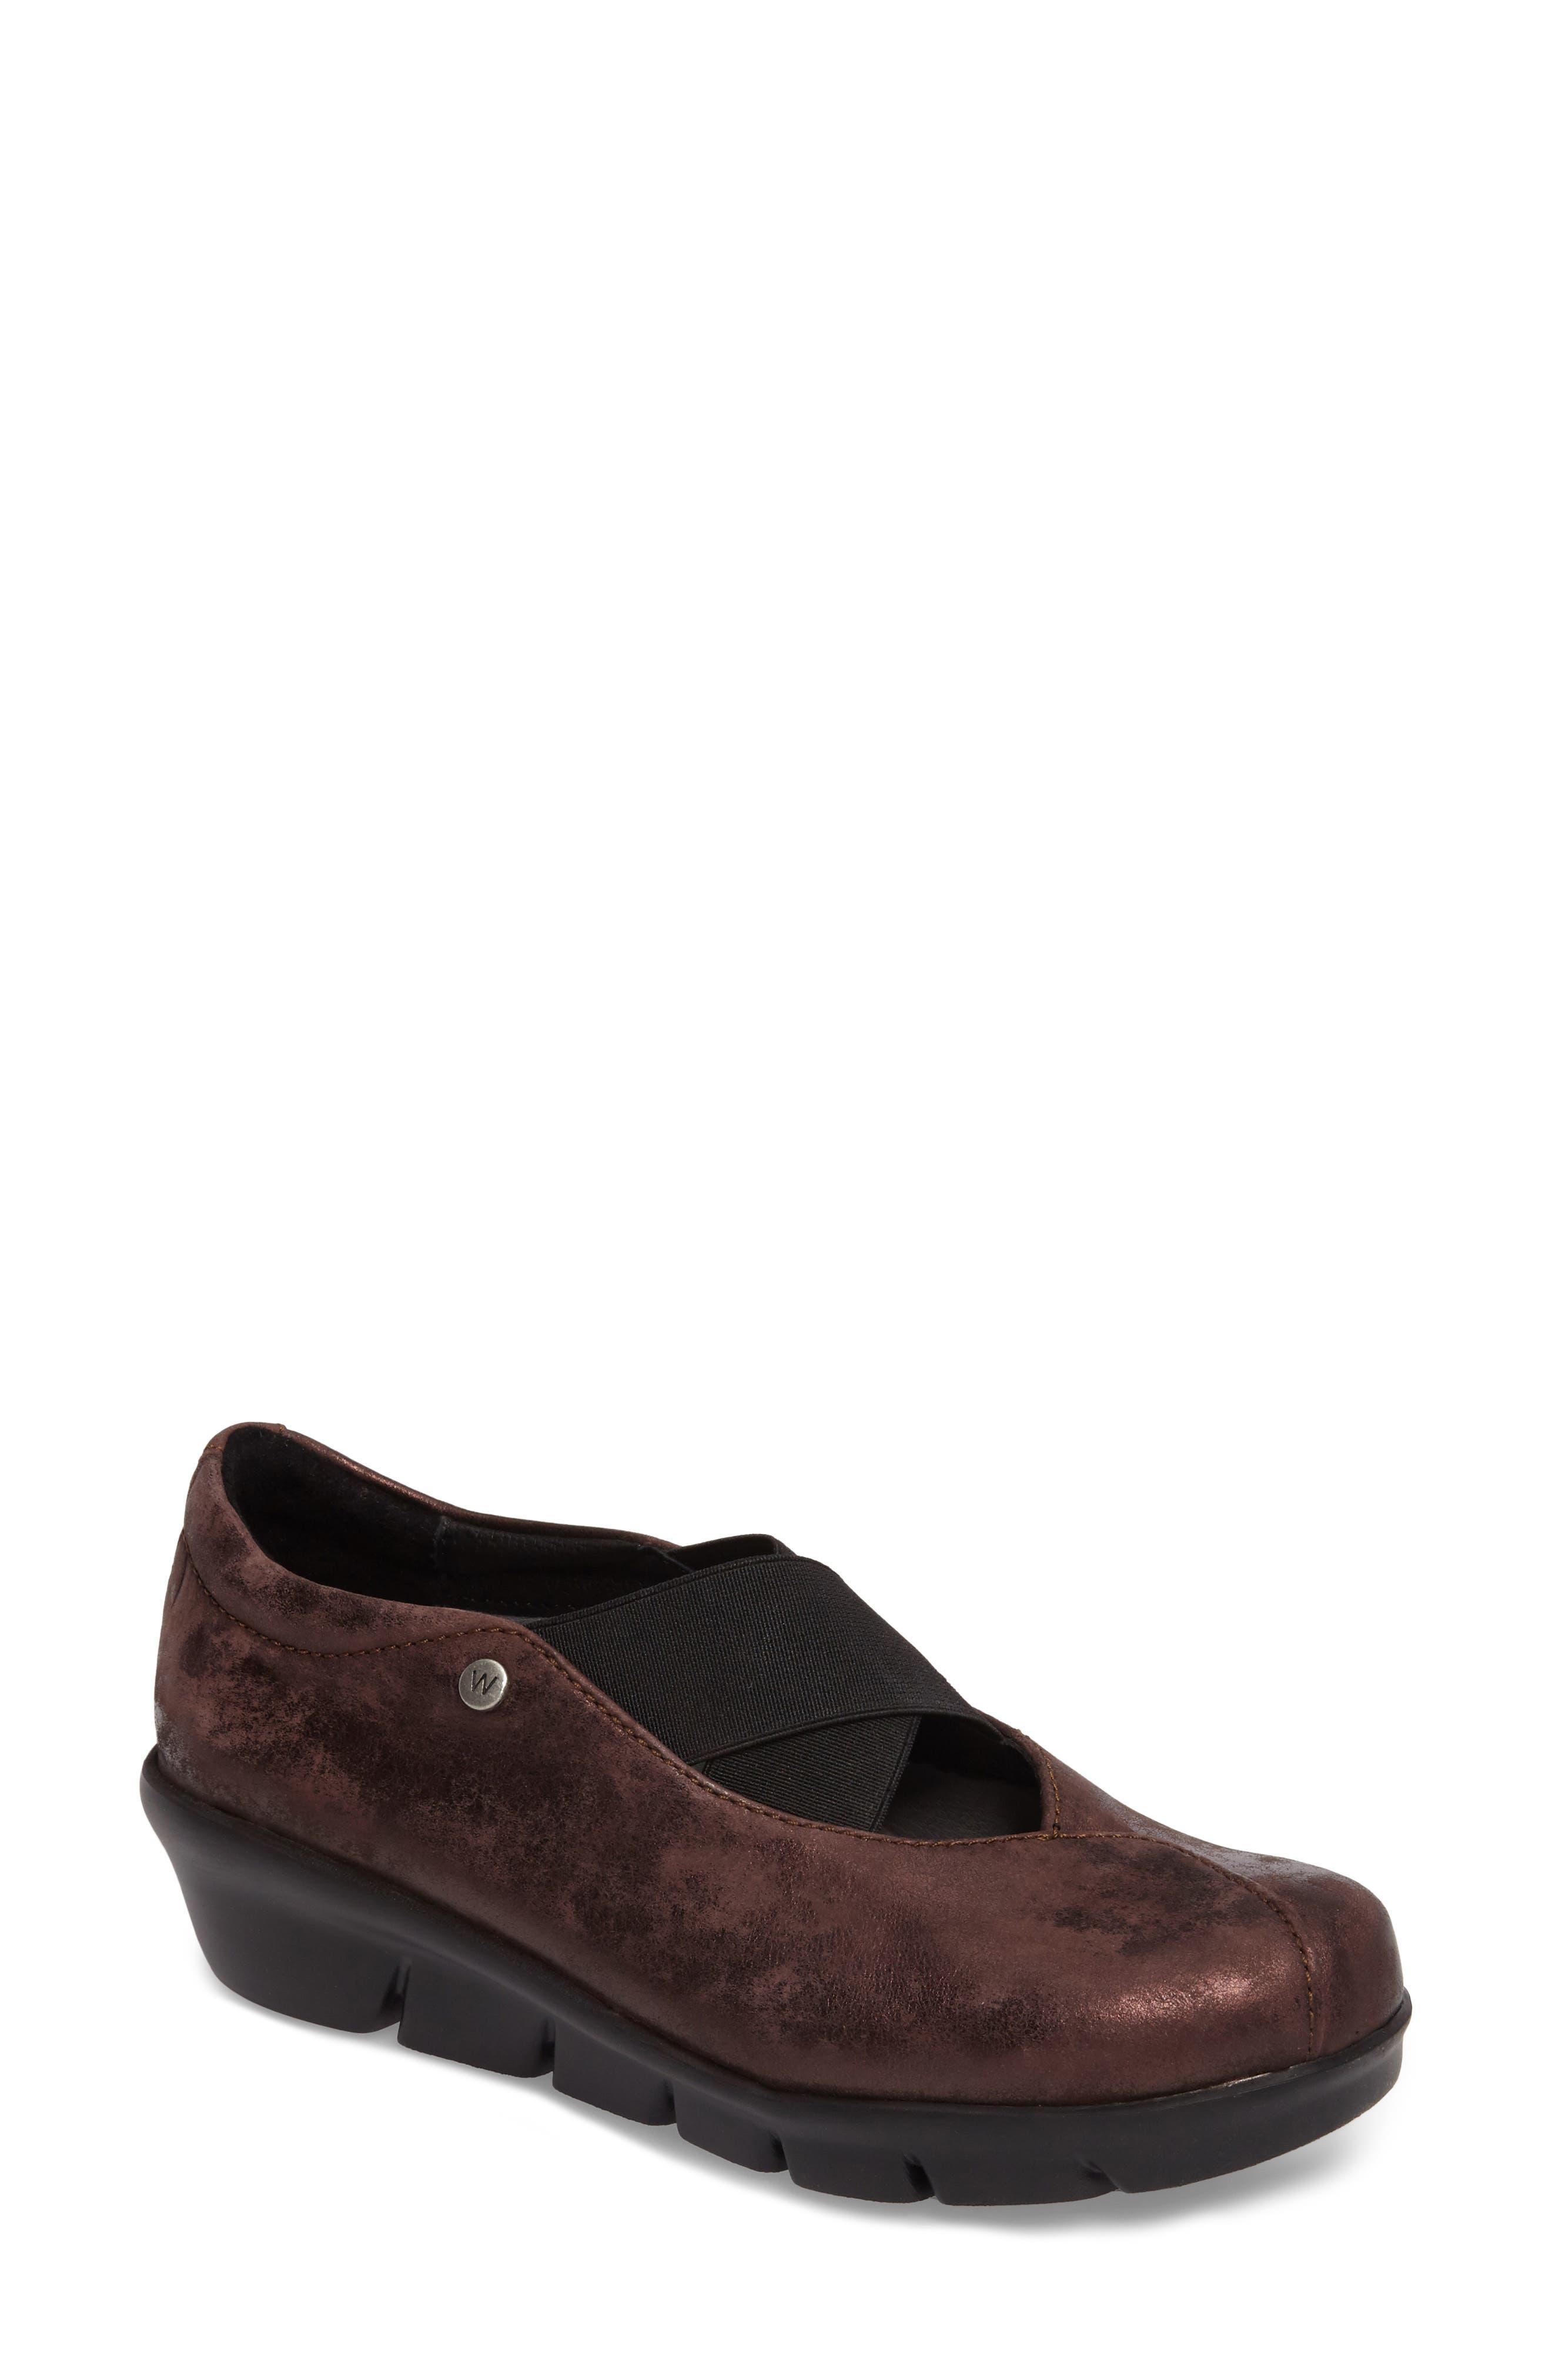 Cursa Slip-On Sneaker,                             Main thumbnail 1, color,                             Mocha Leather